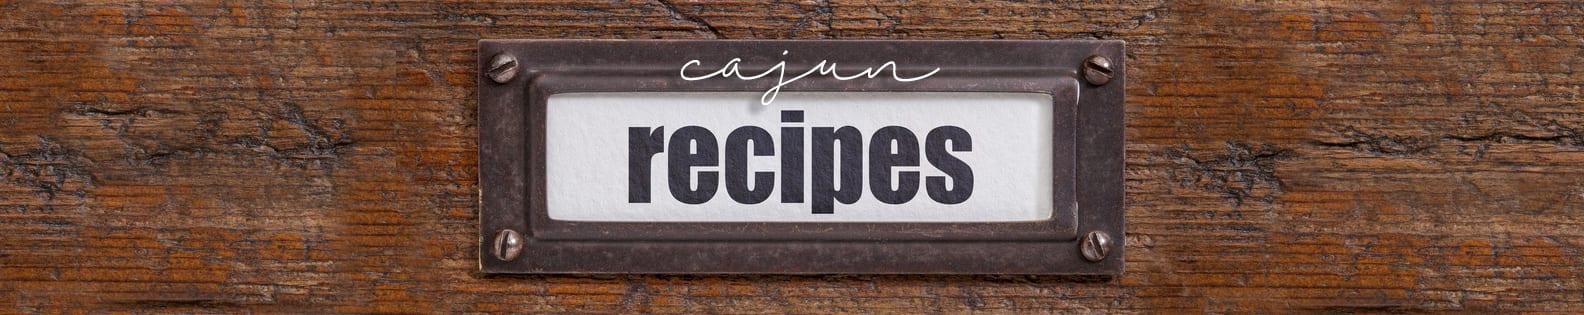 Cajun recipe header